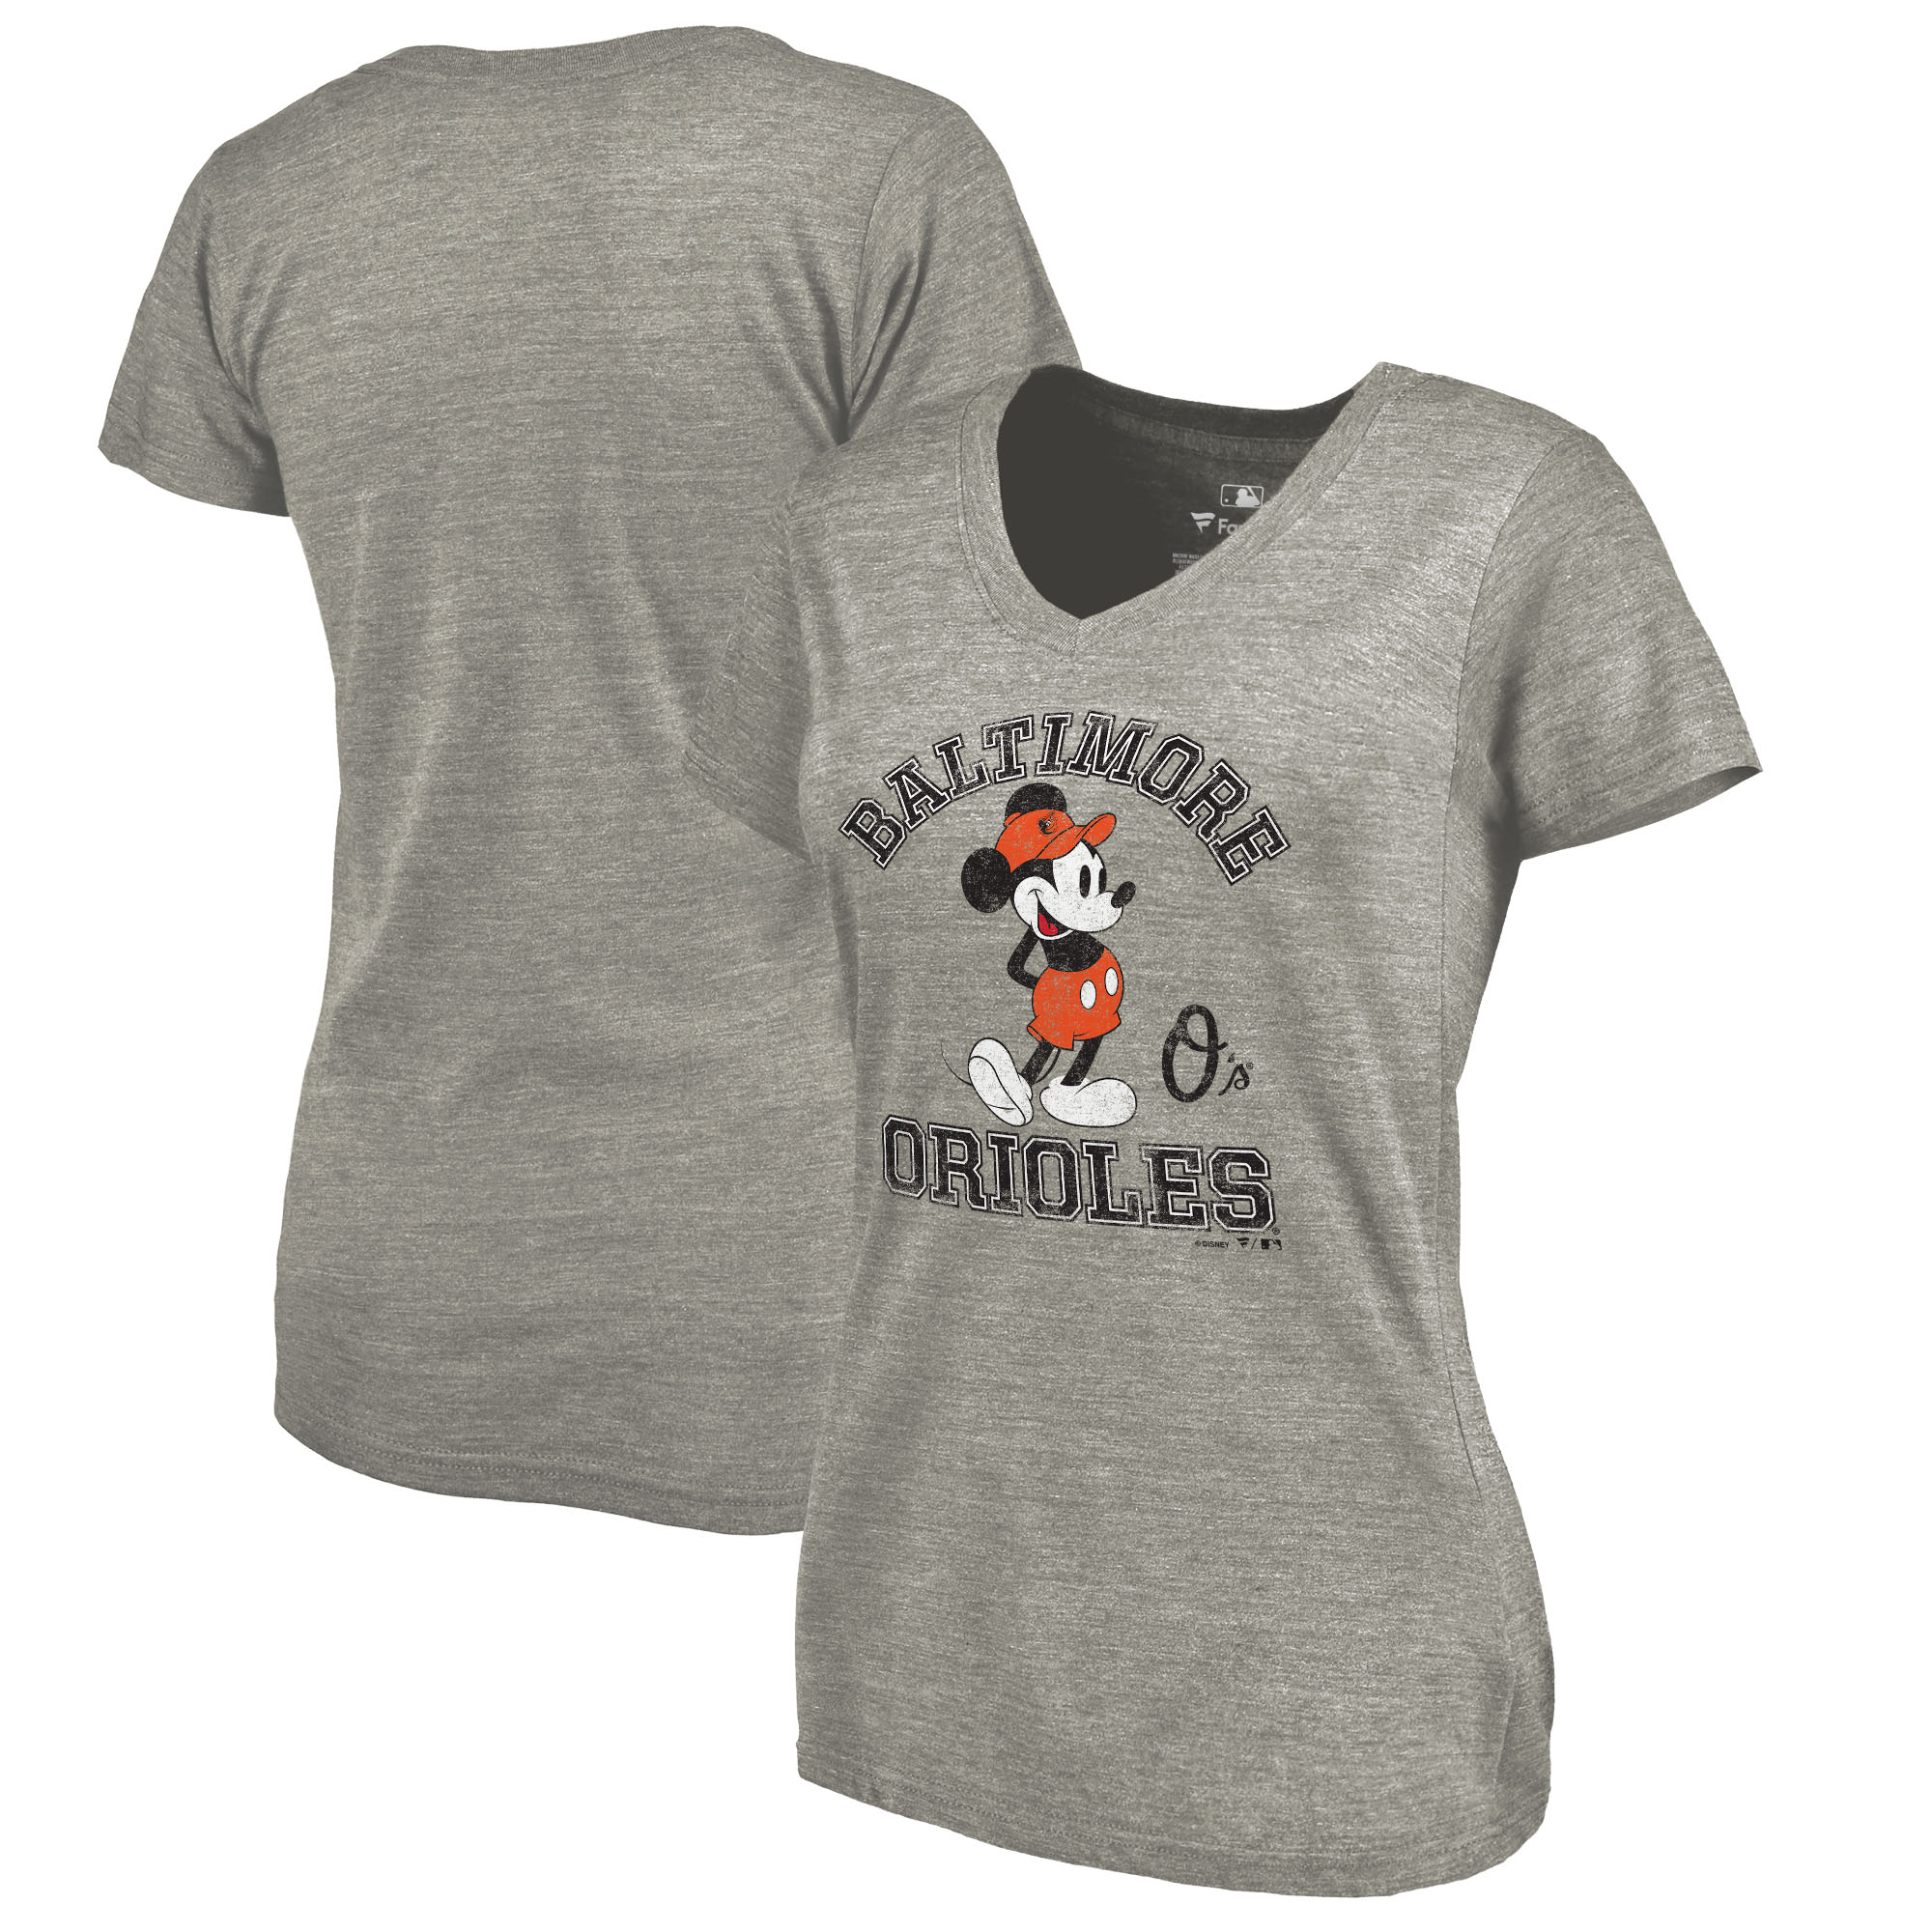 Baltimore Orioles Fanatics Branded Women's Disney MLB Tradition Tri-Blend V-Neck T-Shirt - Heathered Gray